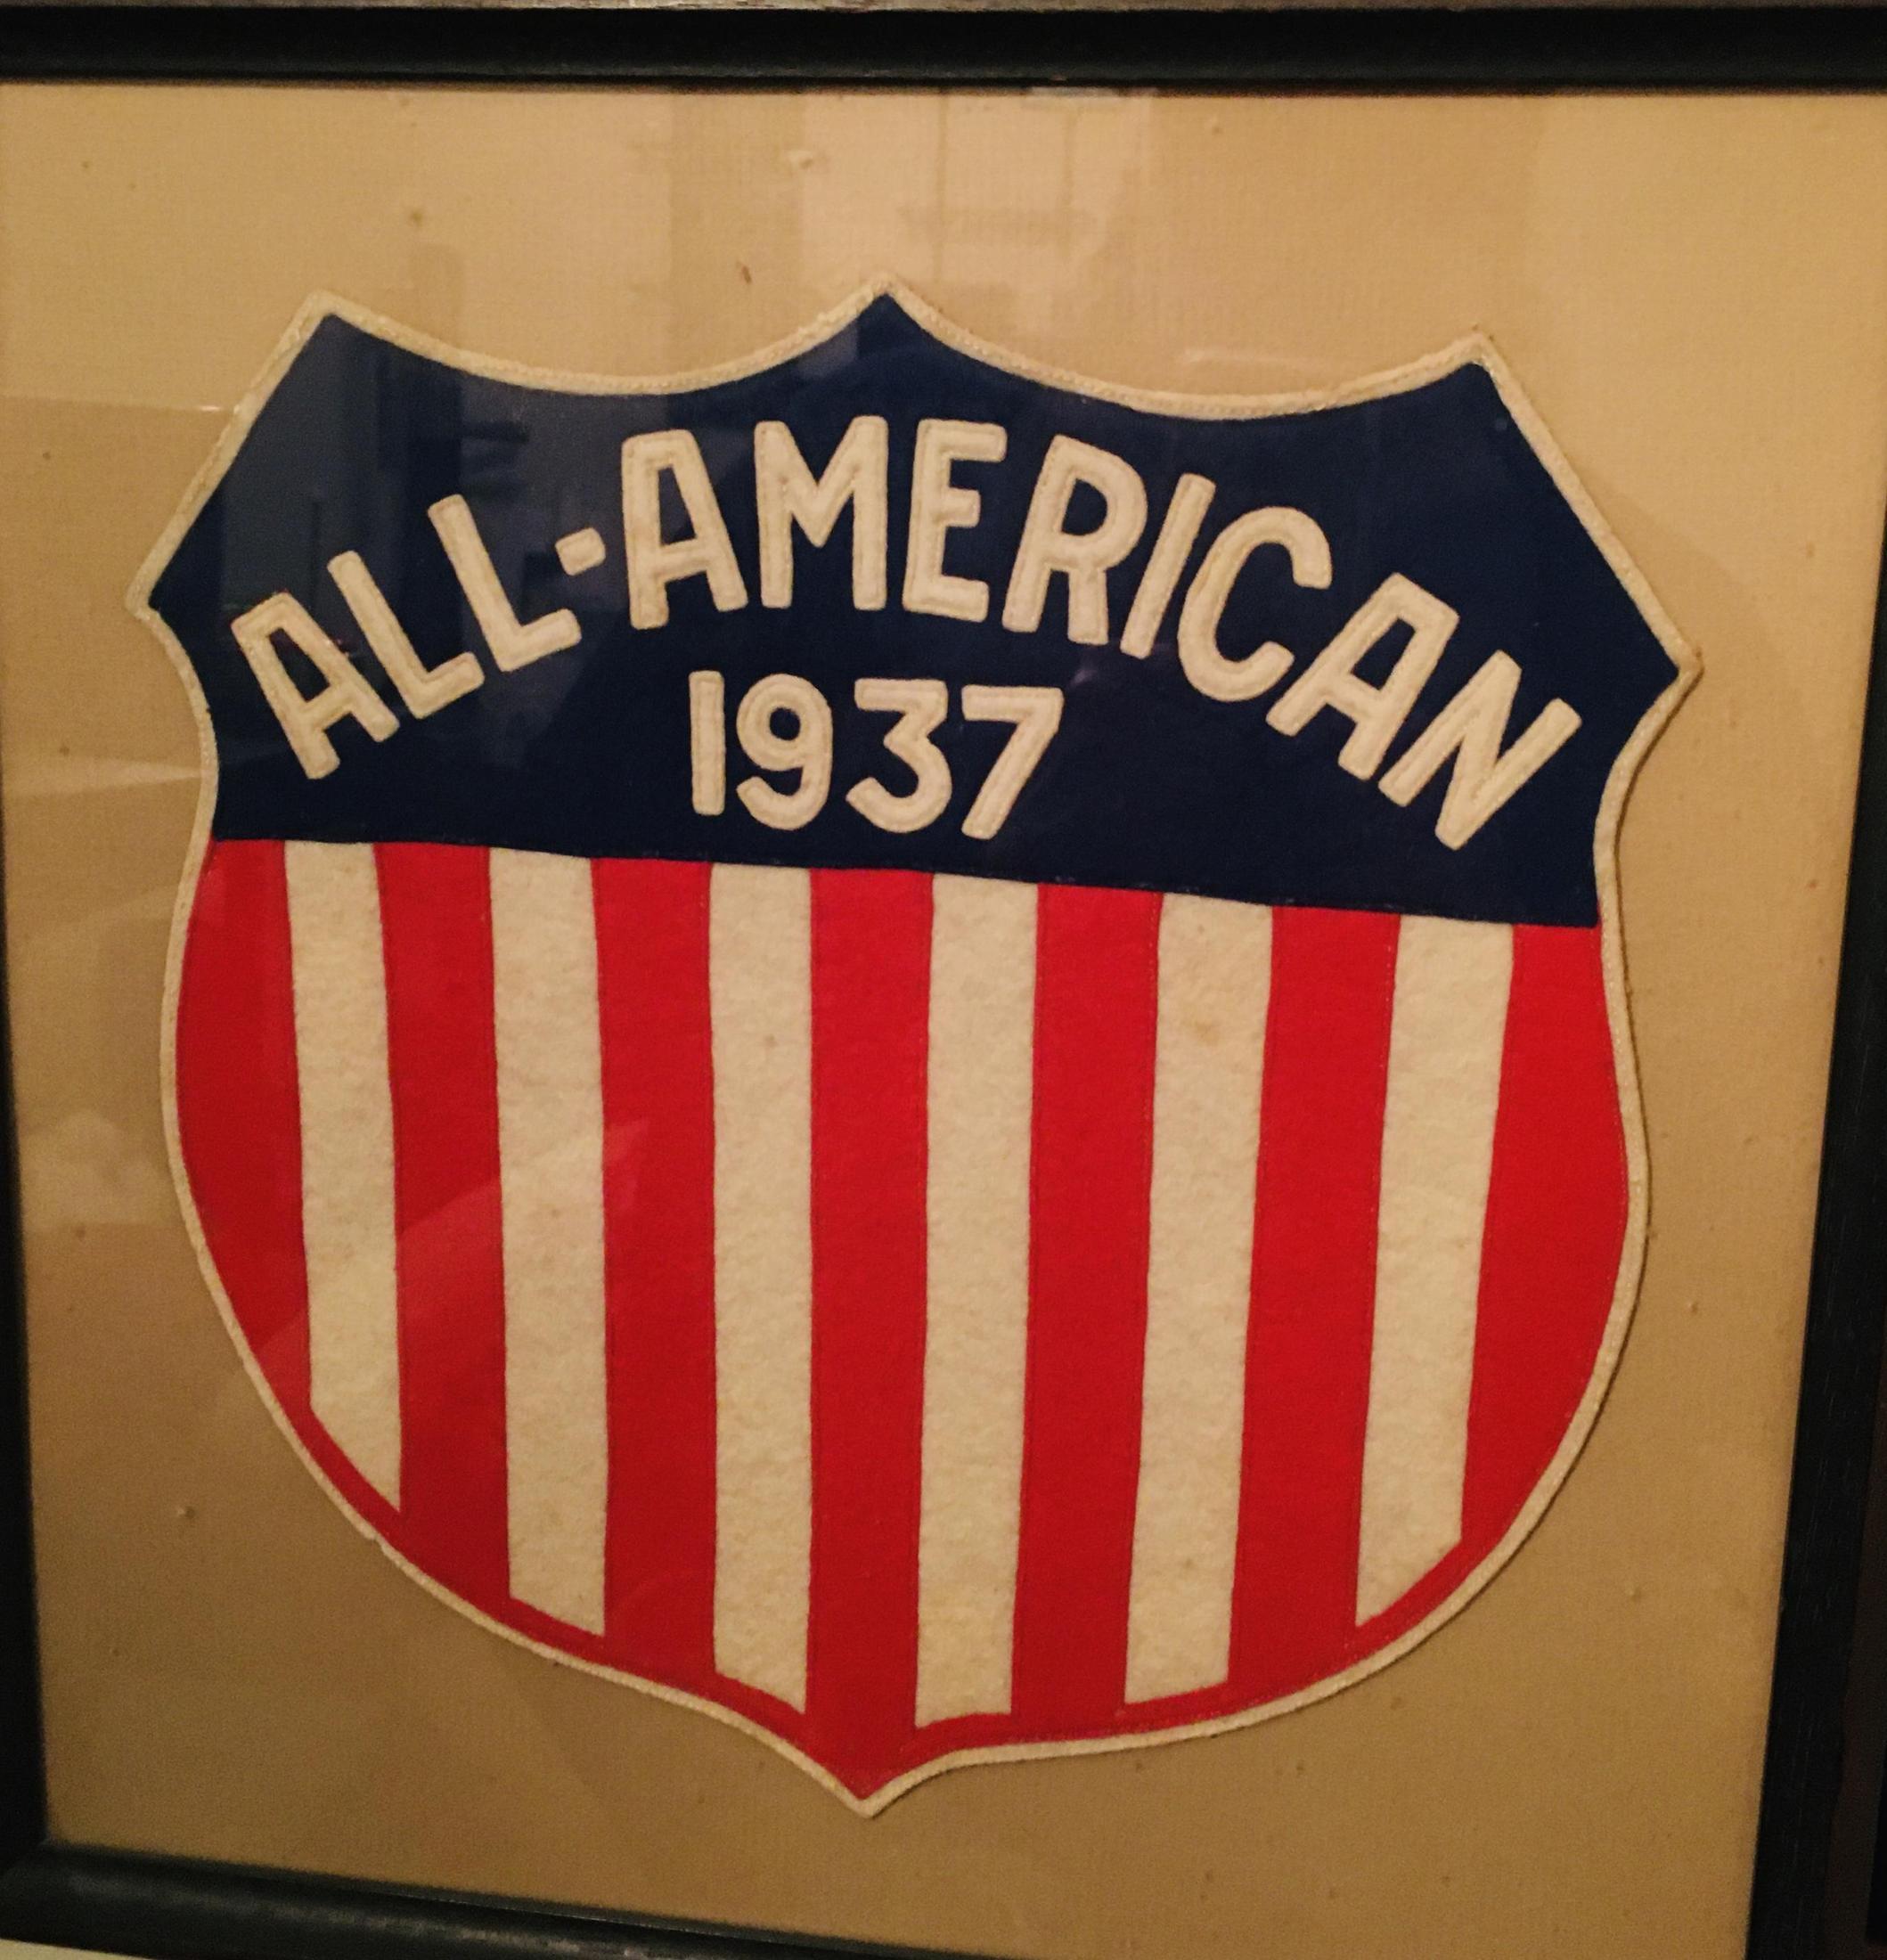 Gerald Dennerlein's All American Chevron